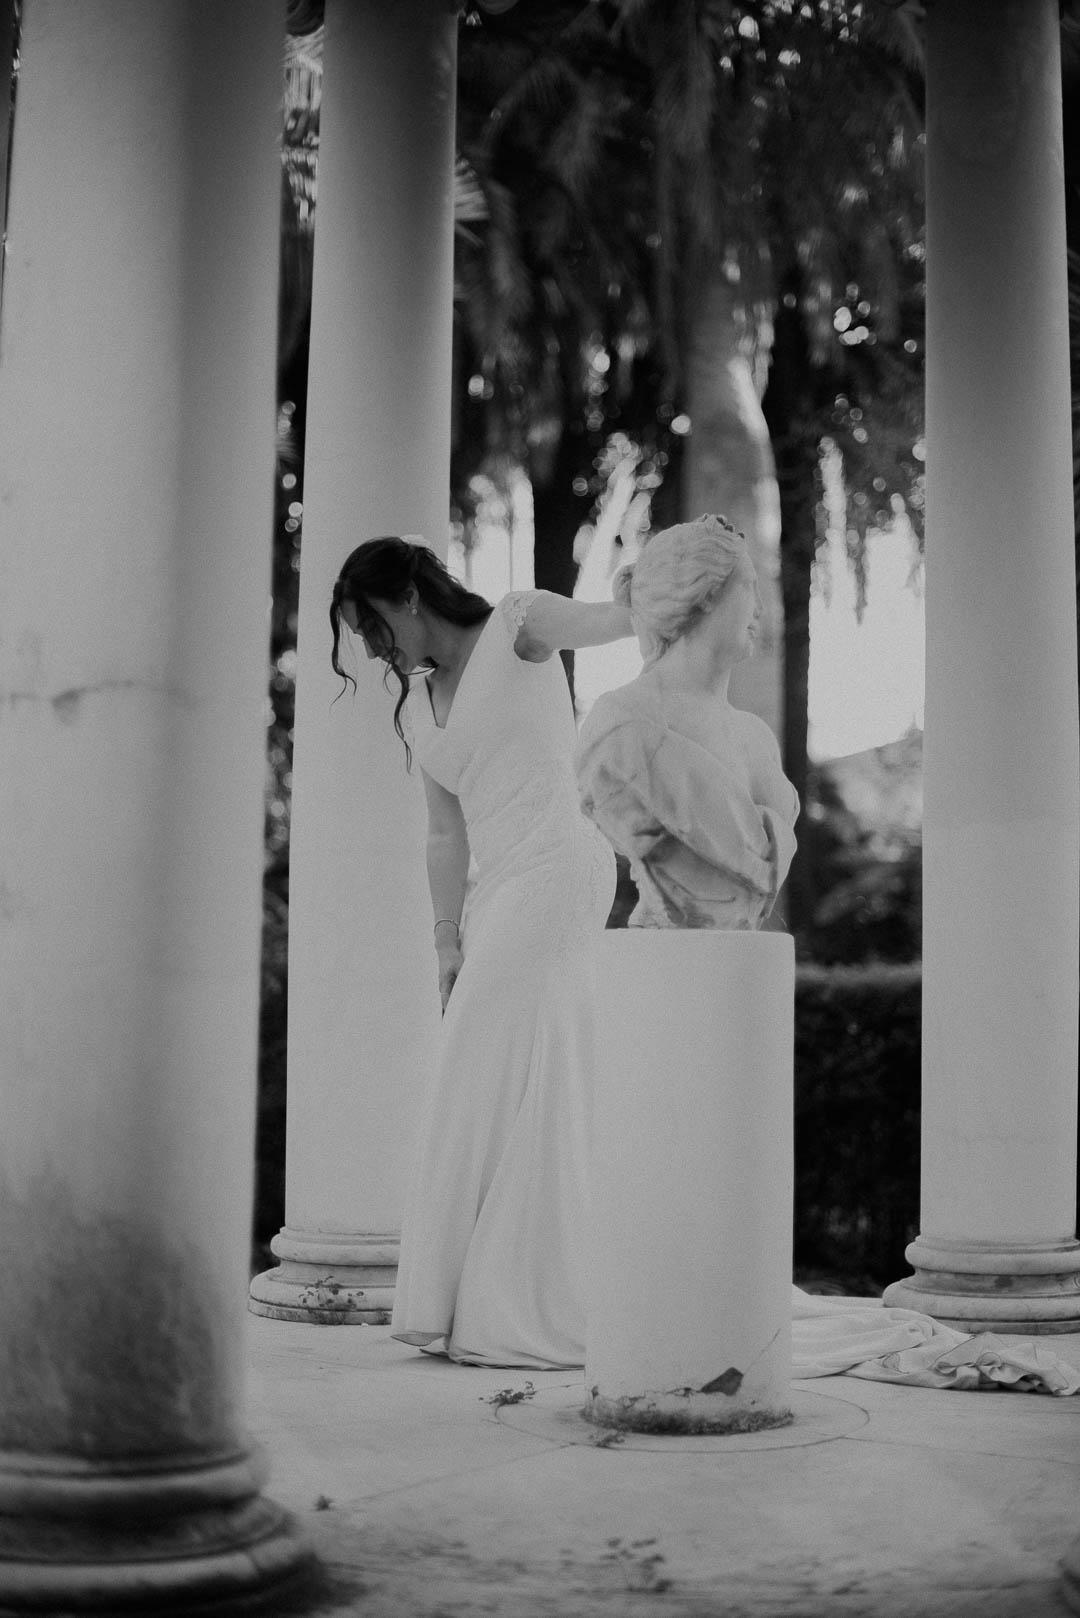 wedding-photographer-destination-fineart-bespoke-reportage-sorrento-parcodeiprincipi-vivianeizzo-spazio46-77